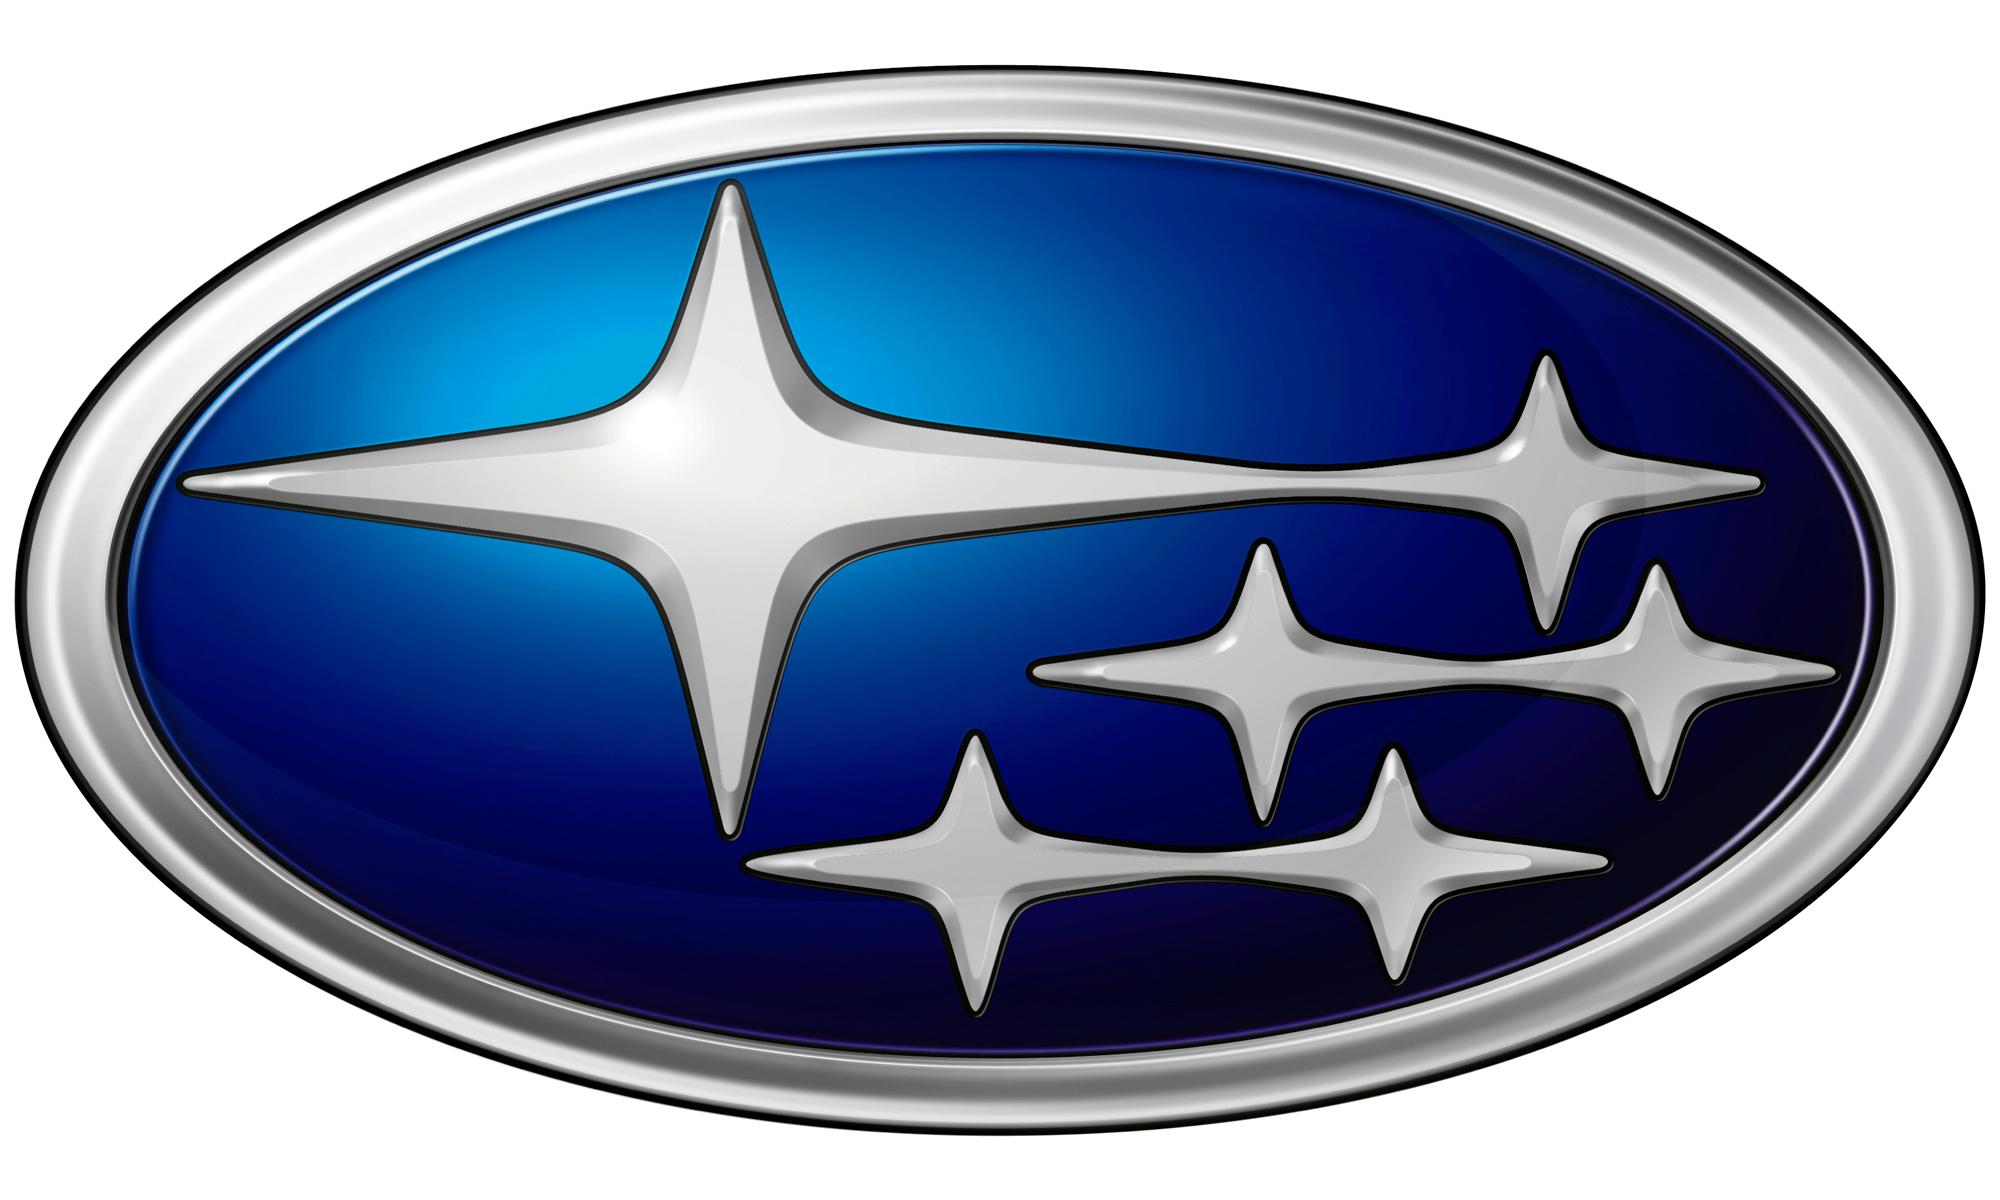 Subaru car logo PNG brand image - Car Logo PNG